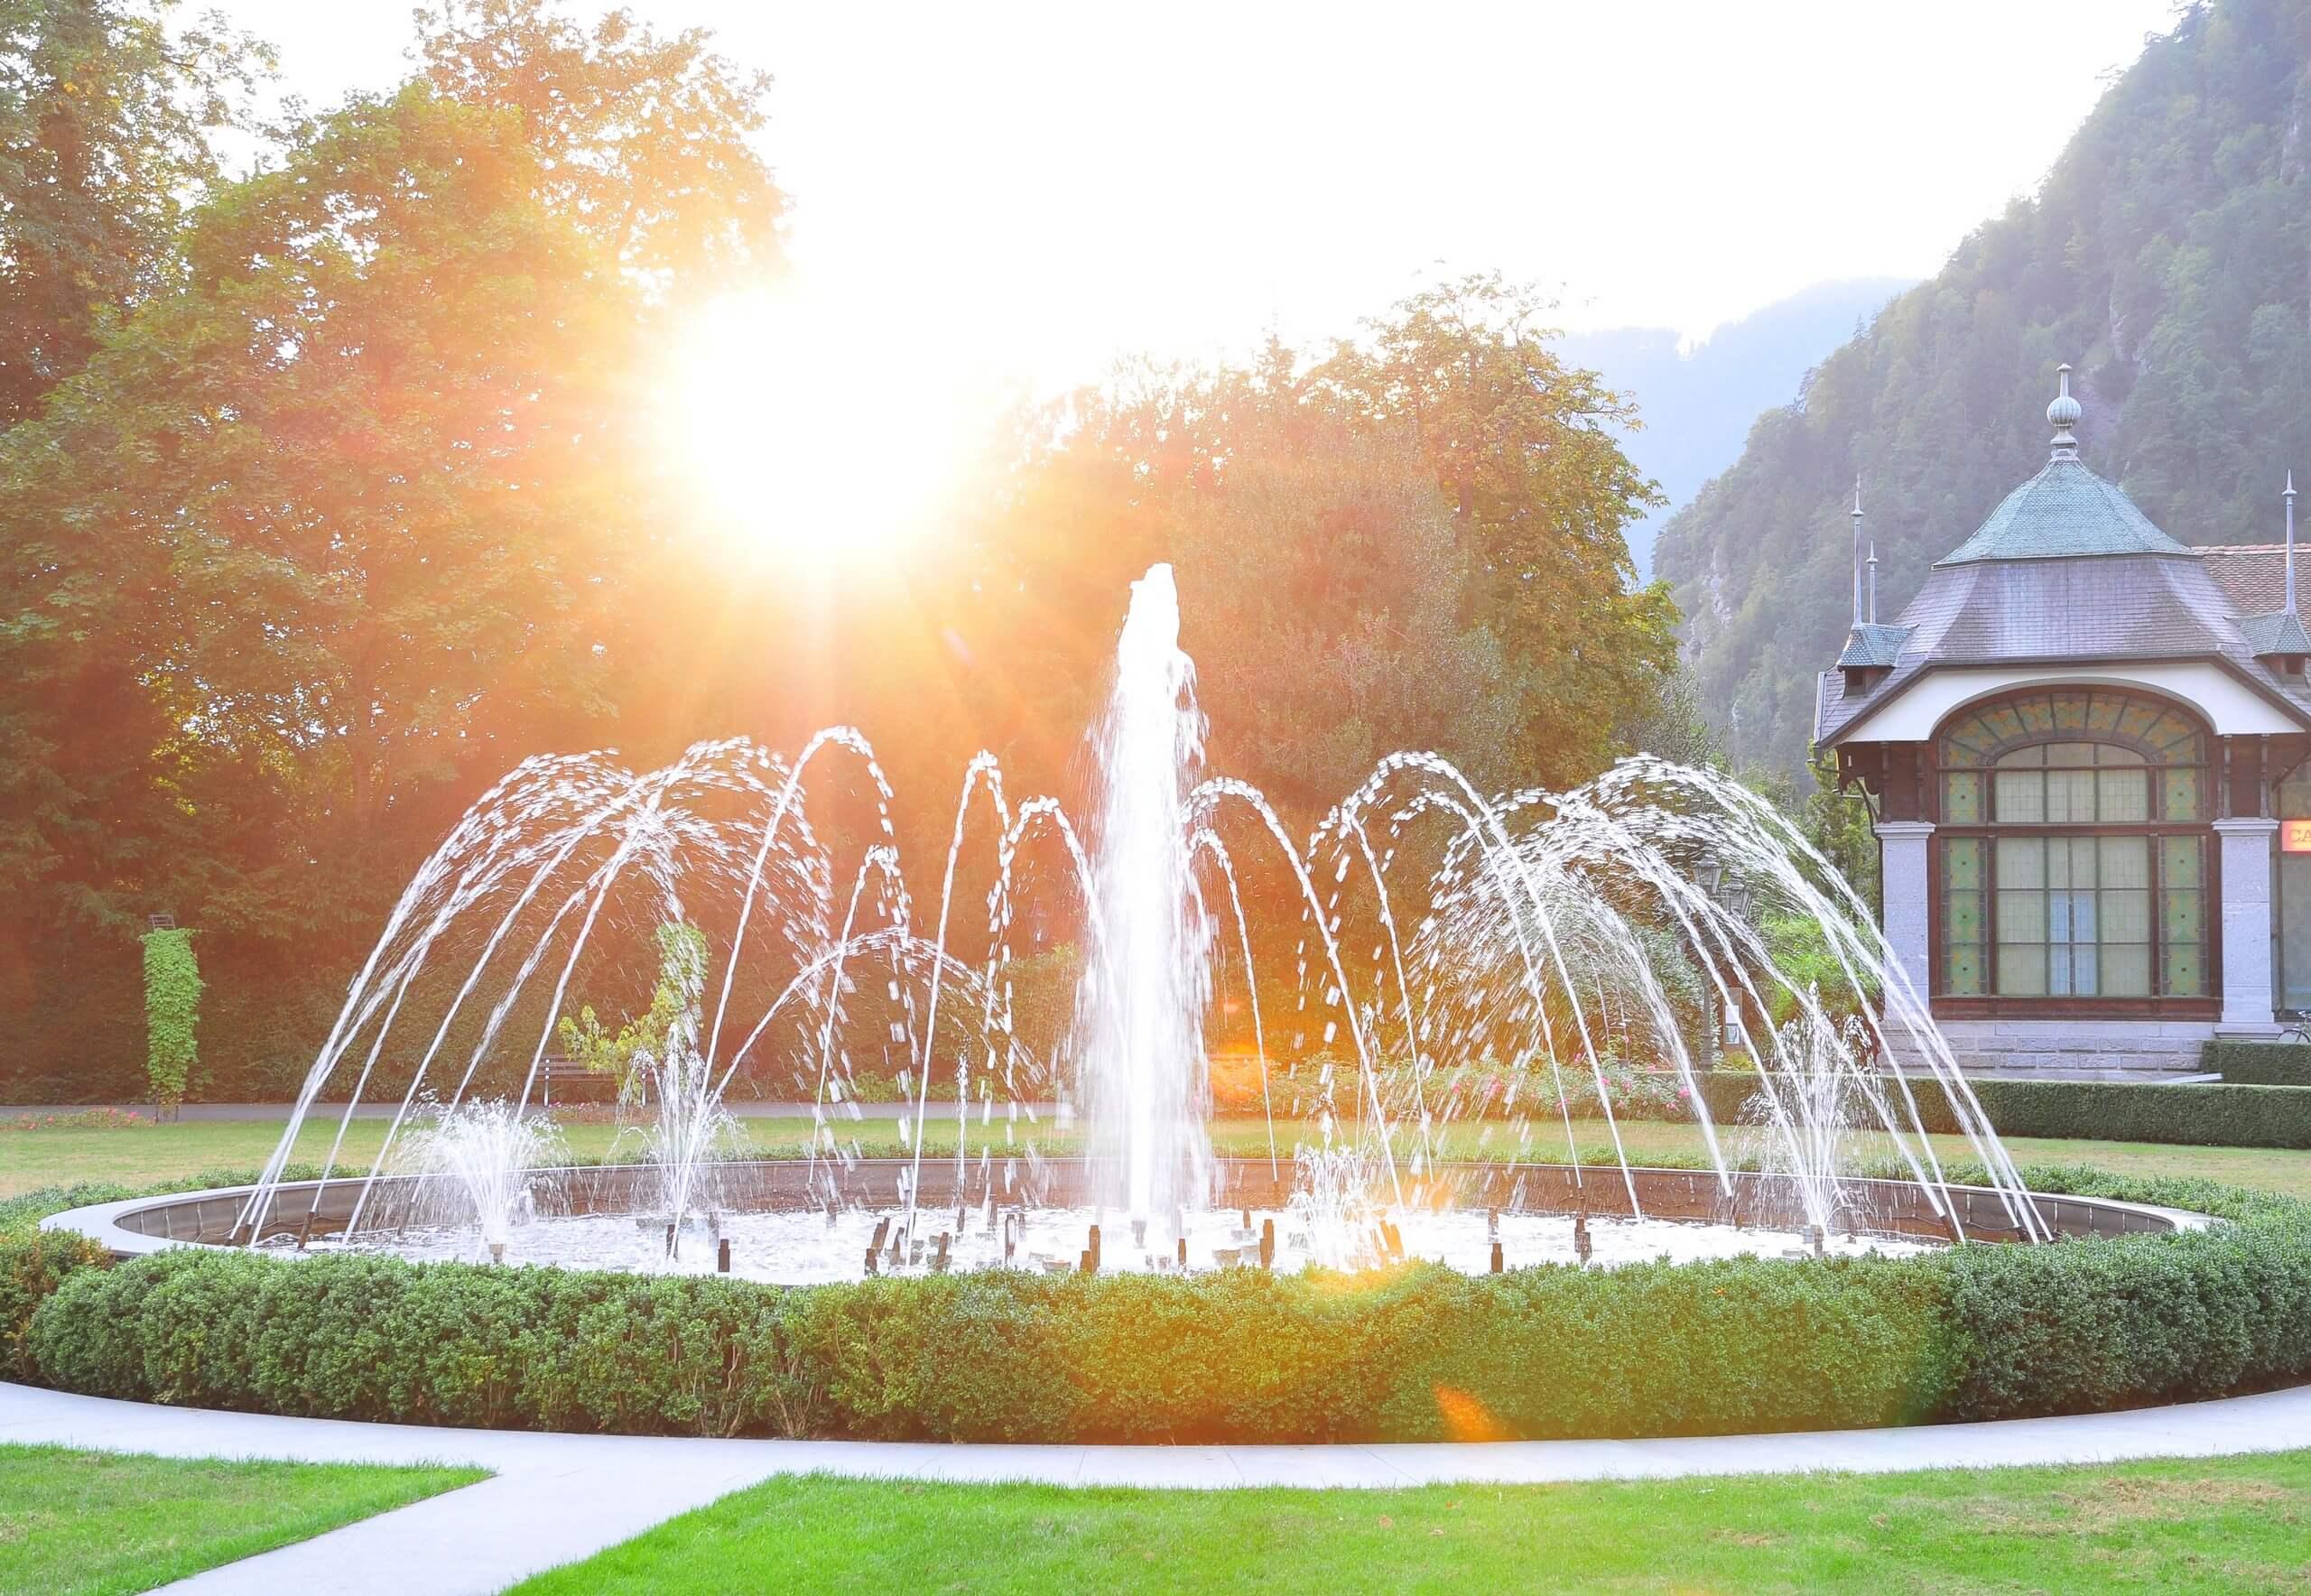 interlaken-sommer-kursaal-park-garten